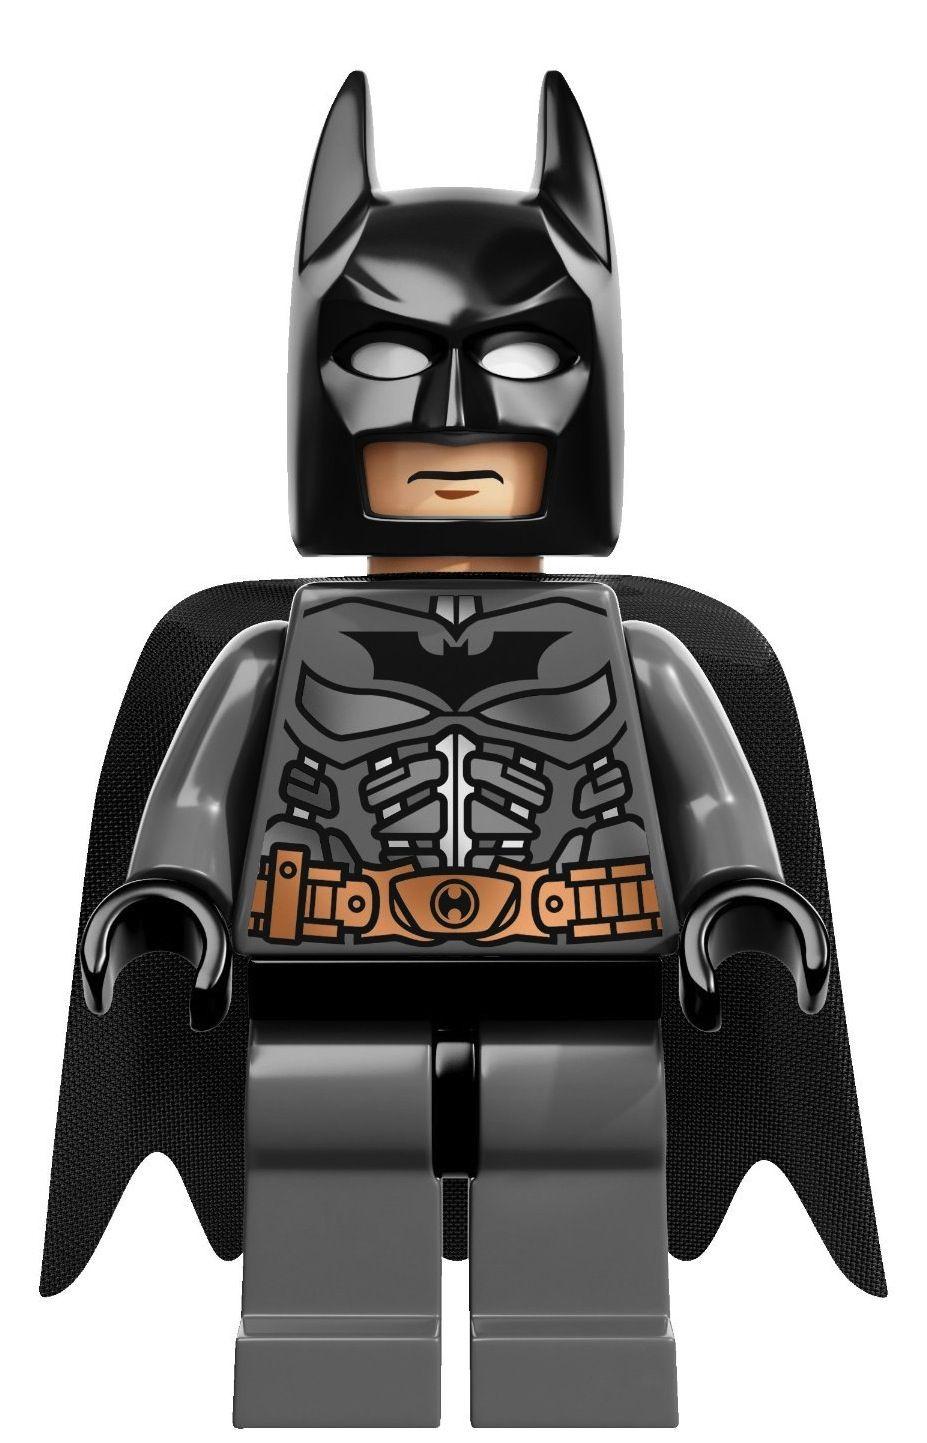 Lego Super Heroes Clipart Lego Batman Super Heroes Chase